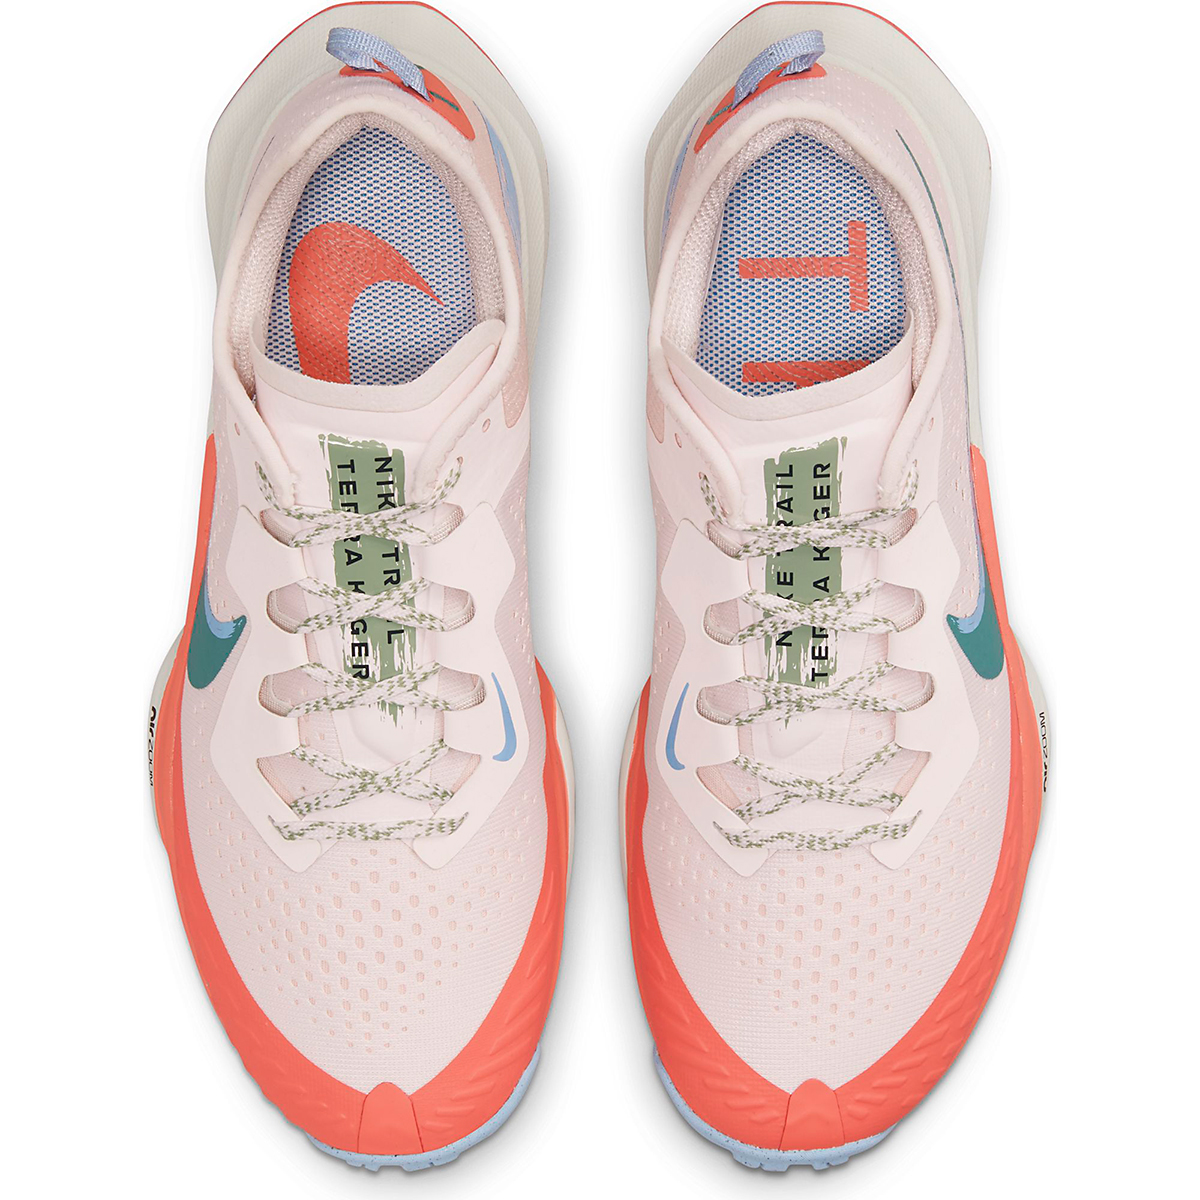 Women's Nike Air Zoom Terra Kiger 7 Trail Running Shoe - Color: Light Soft Pink/Bicoastal/Magic Ember - Size: 5 - Width: Regular, Light Soft Pink/Bicoastal/Magic Ember, large, image 3